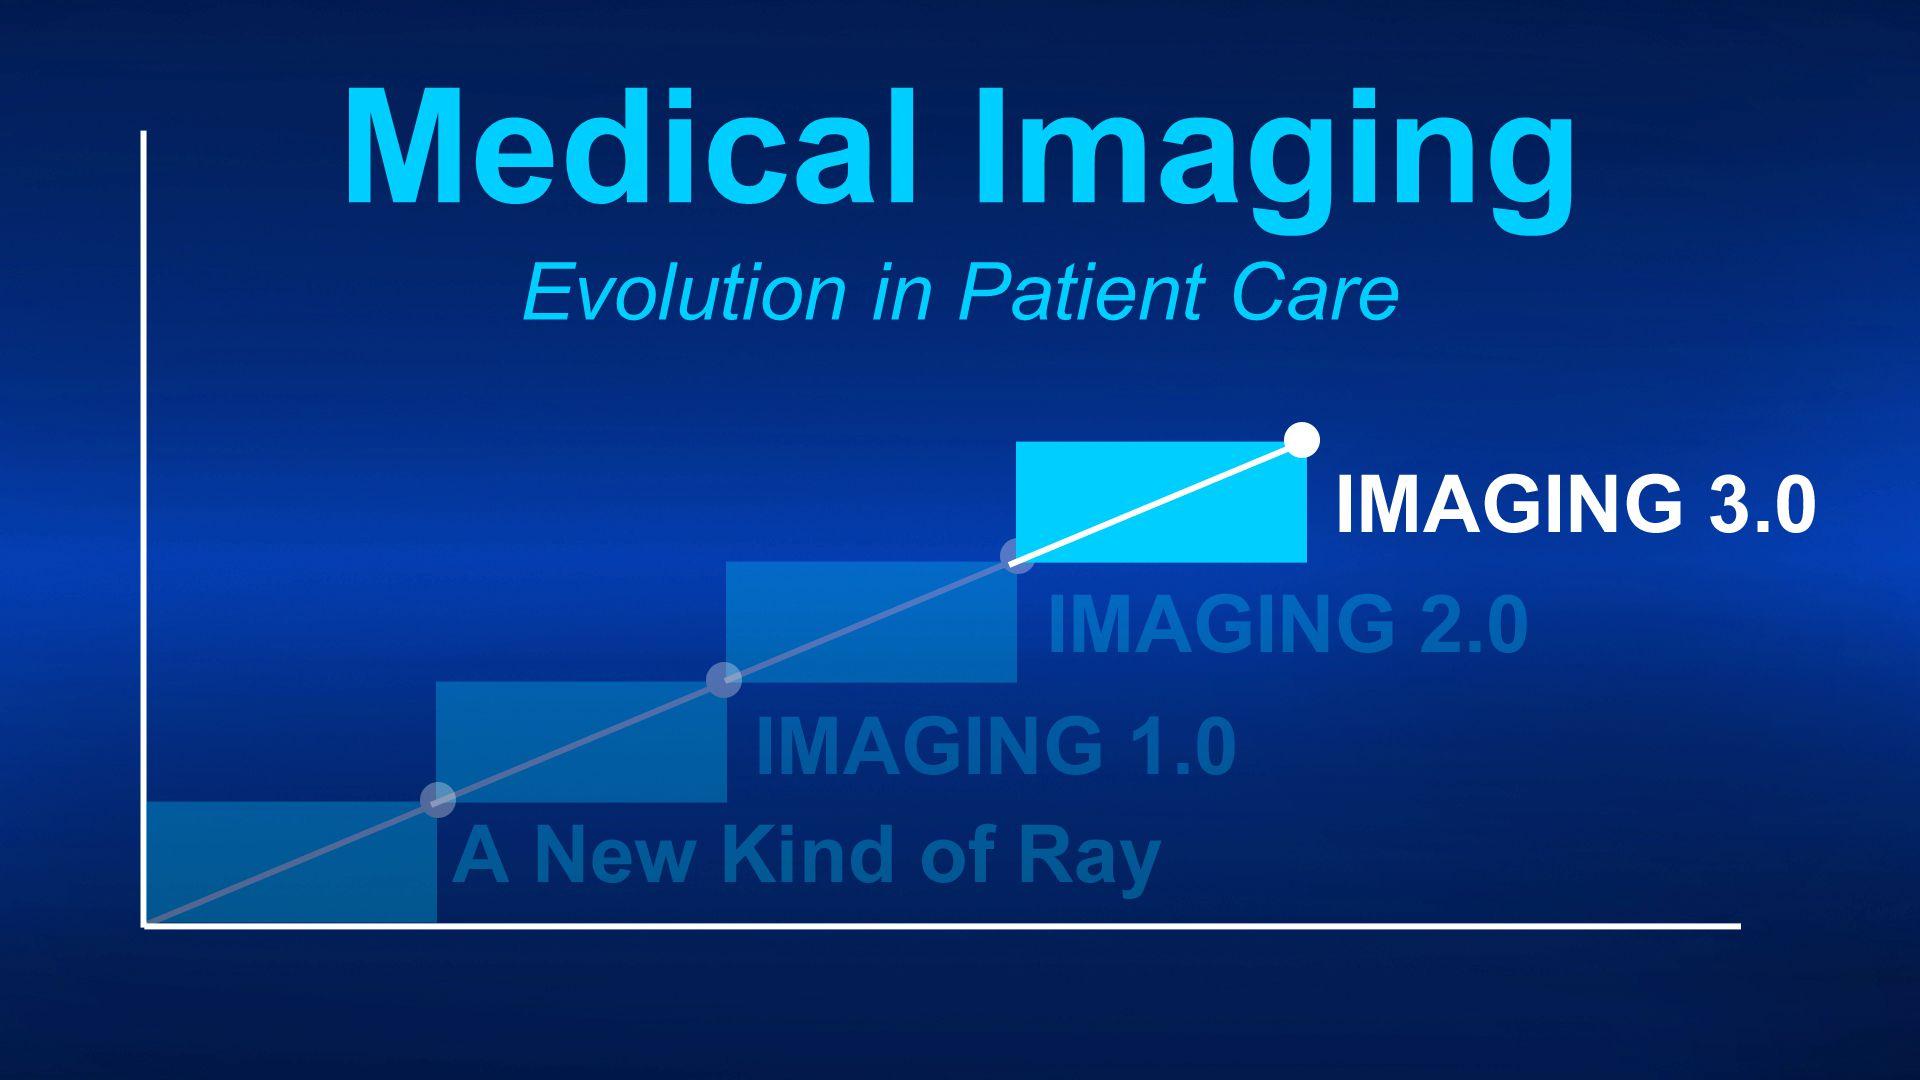 Medical Imaging Evolution in Patient Care